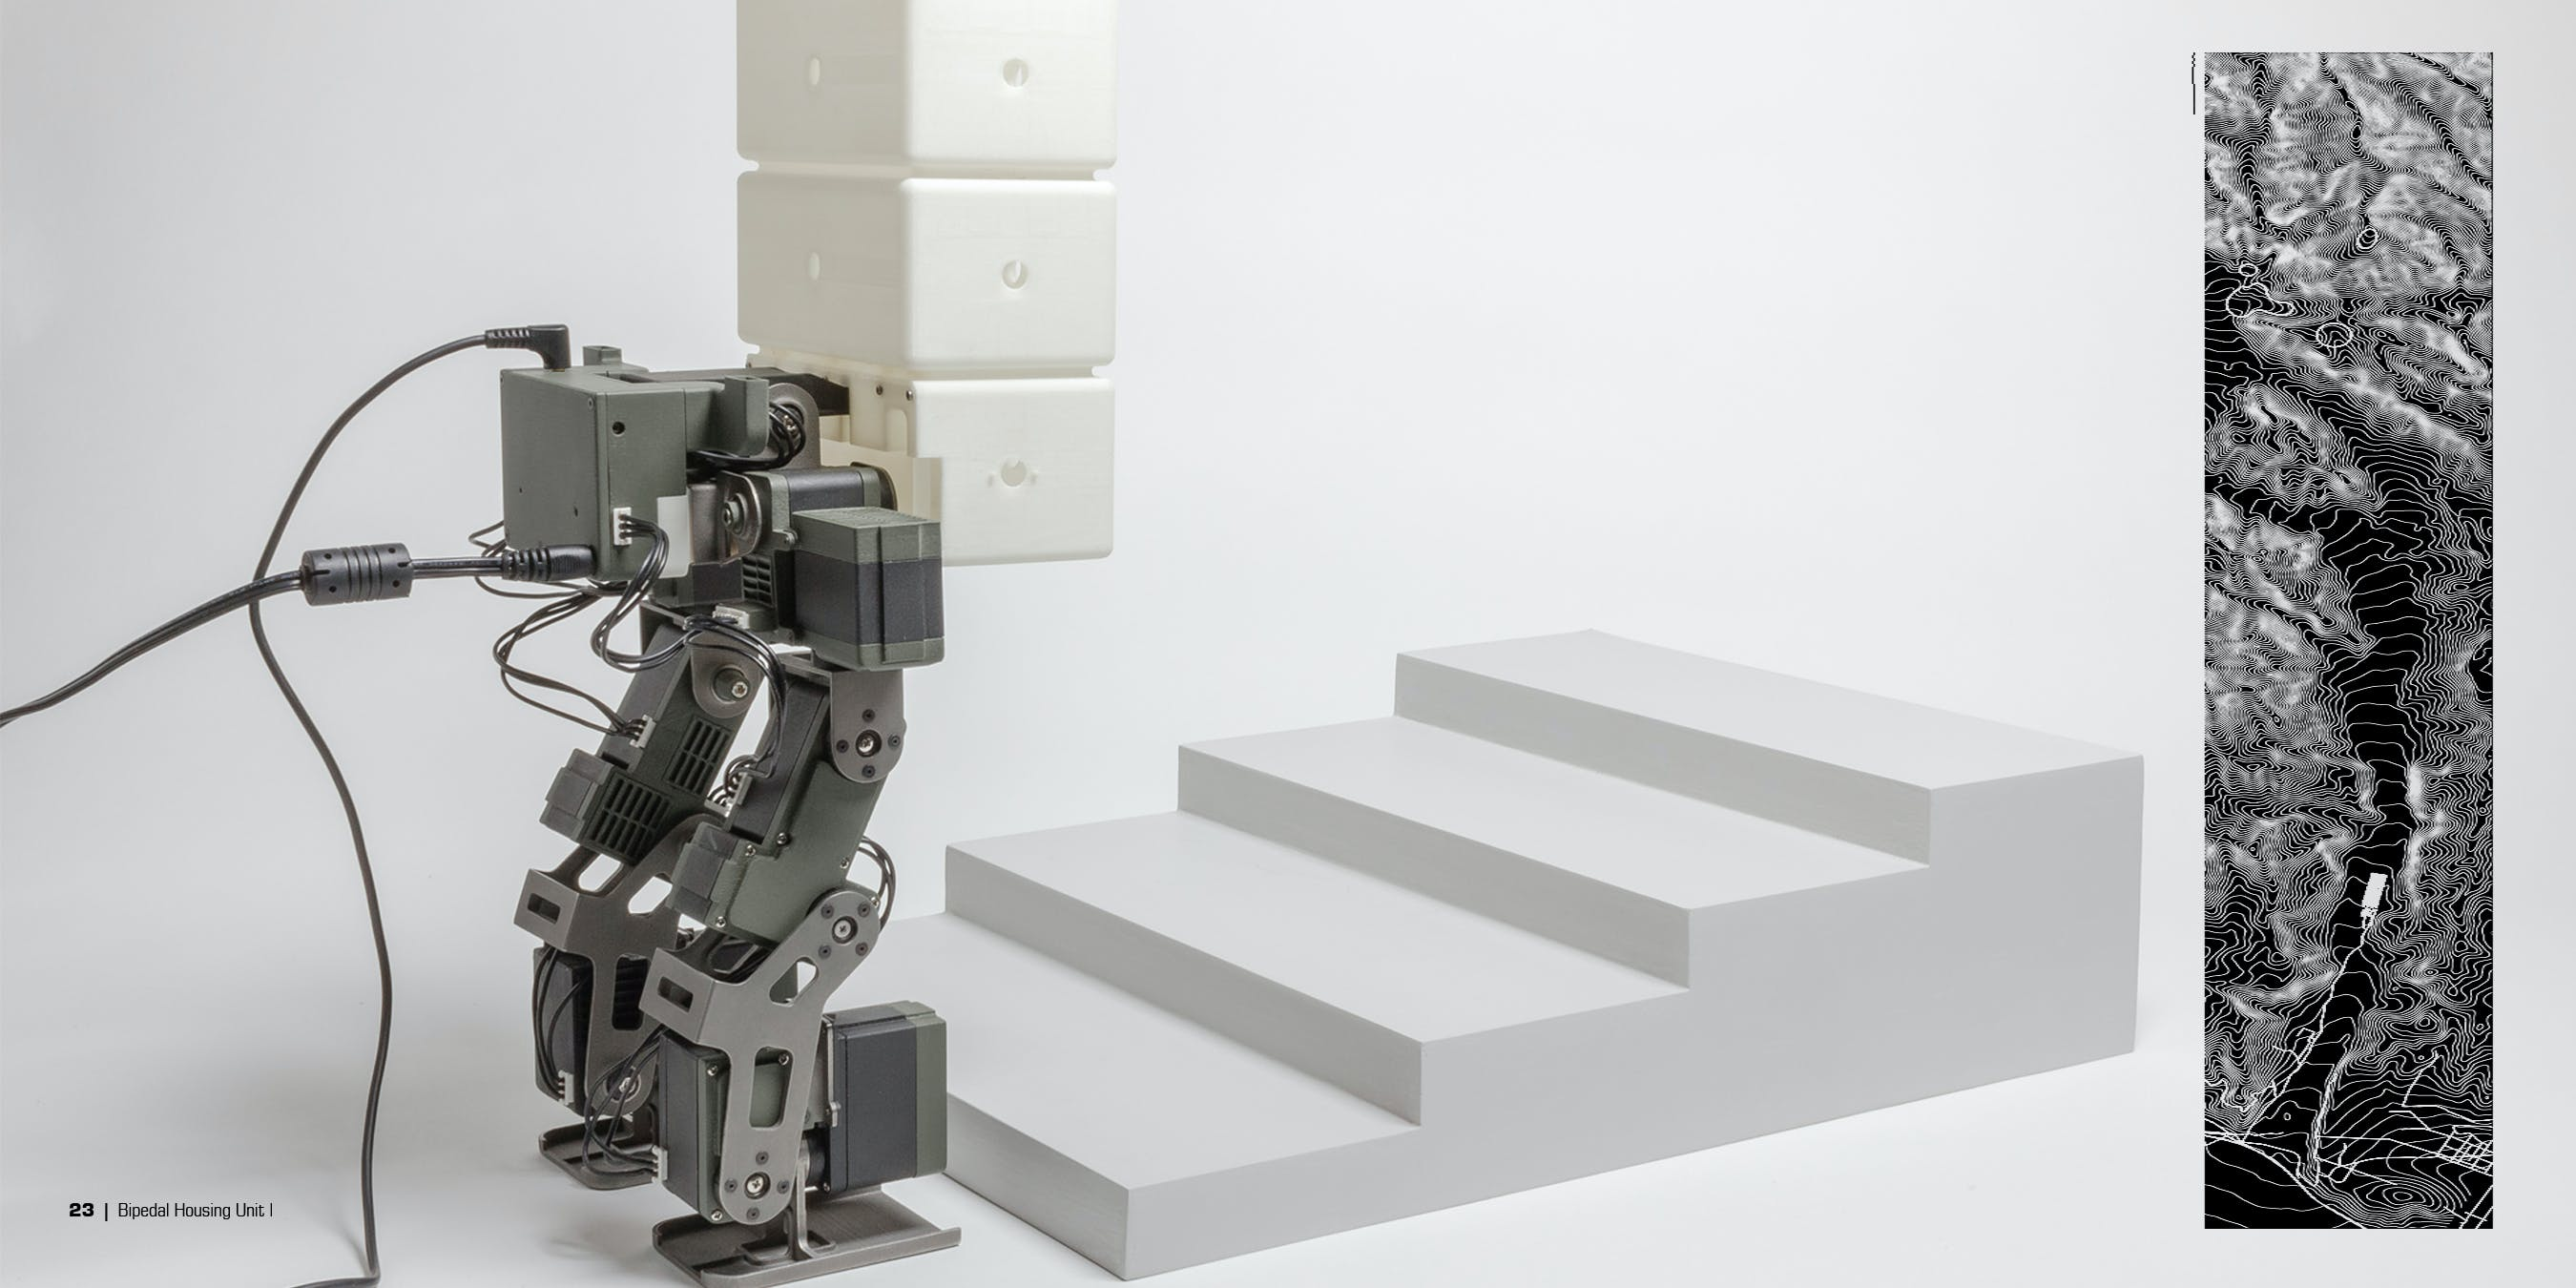 Bipedal Housing Unit (fully functional, scaled prototype model ...